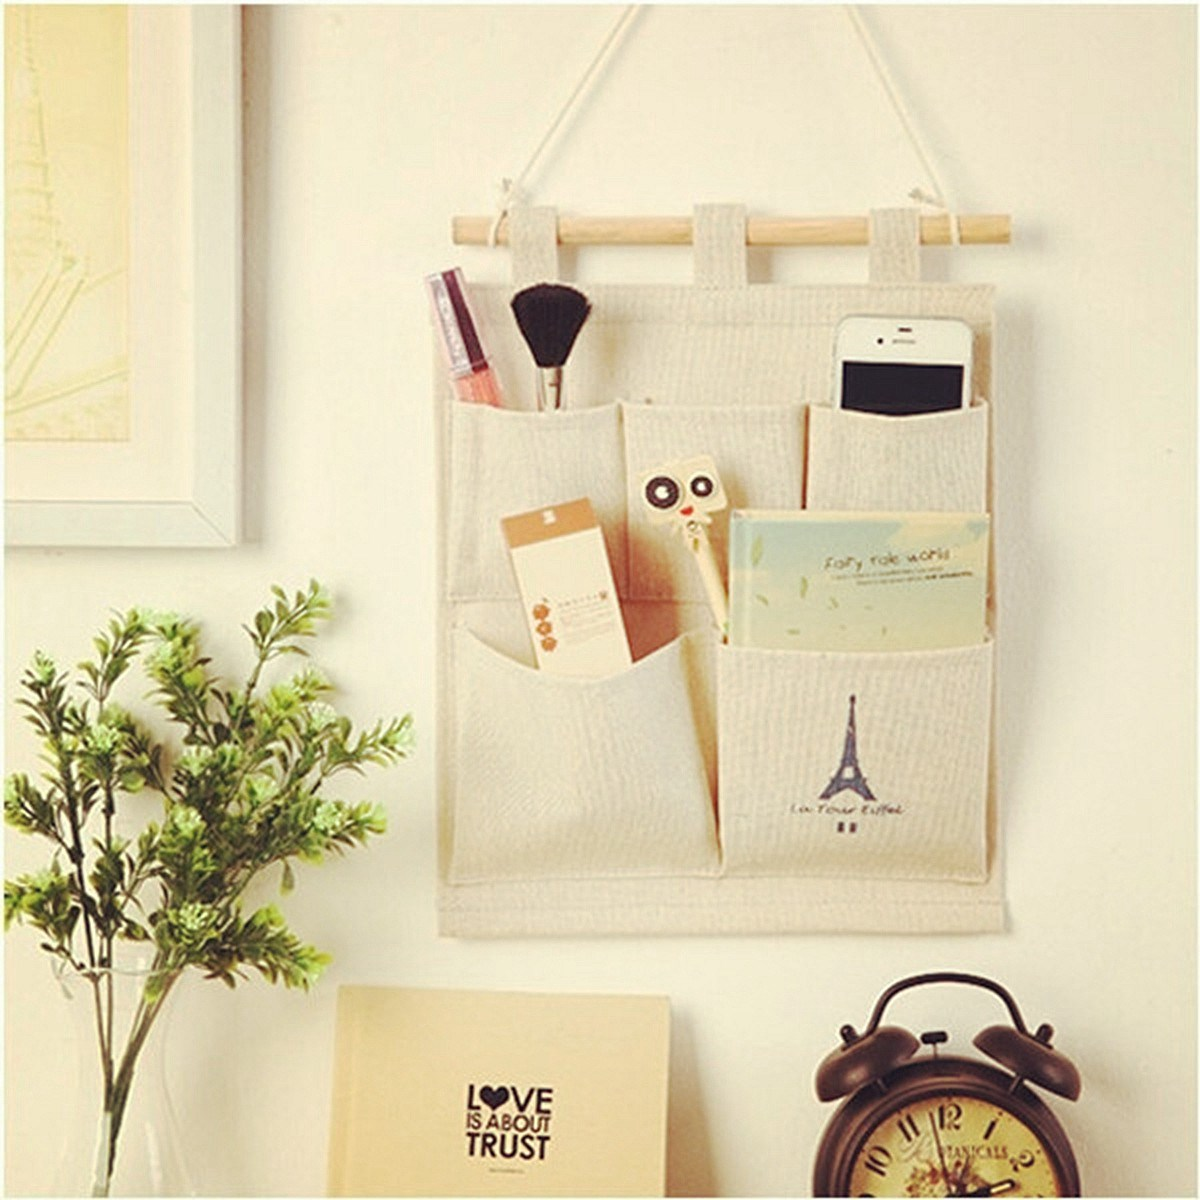 5 Pockets Cotton Jute Hanging Storage Bag Living Room Door Wall Organizer  Home Office Sundries Holder